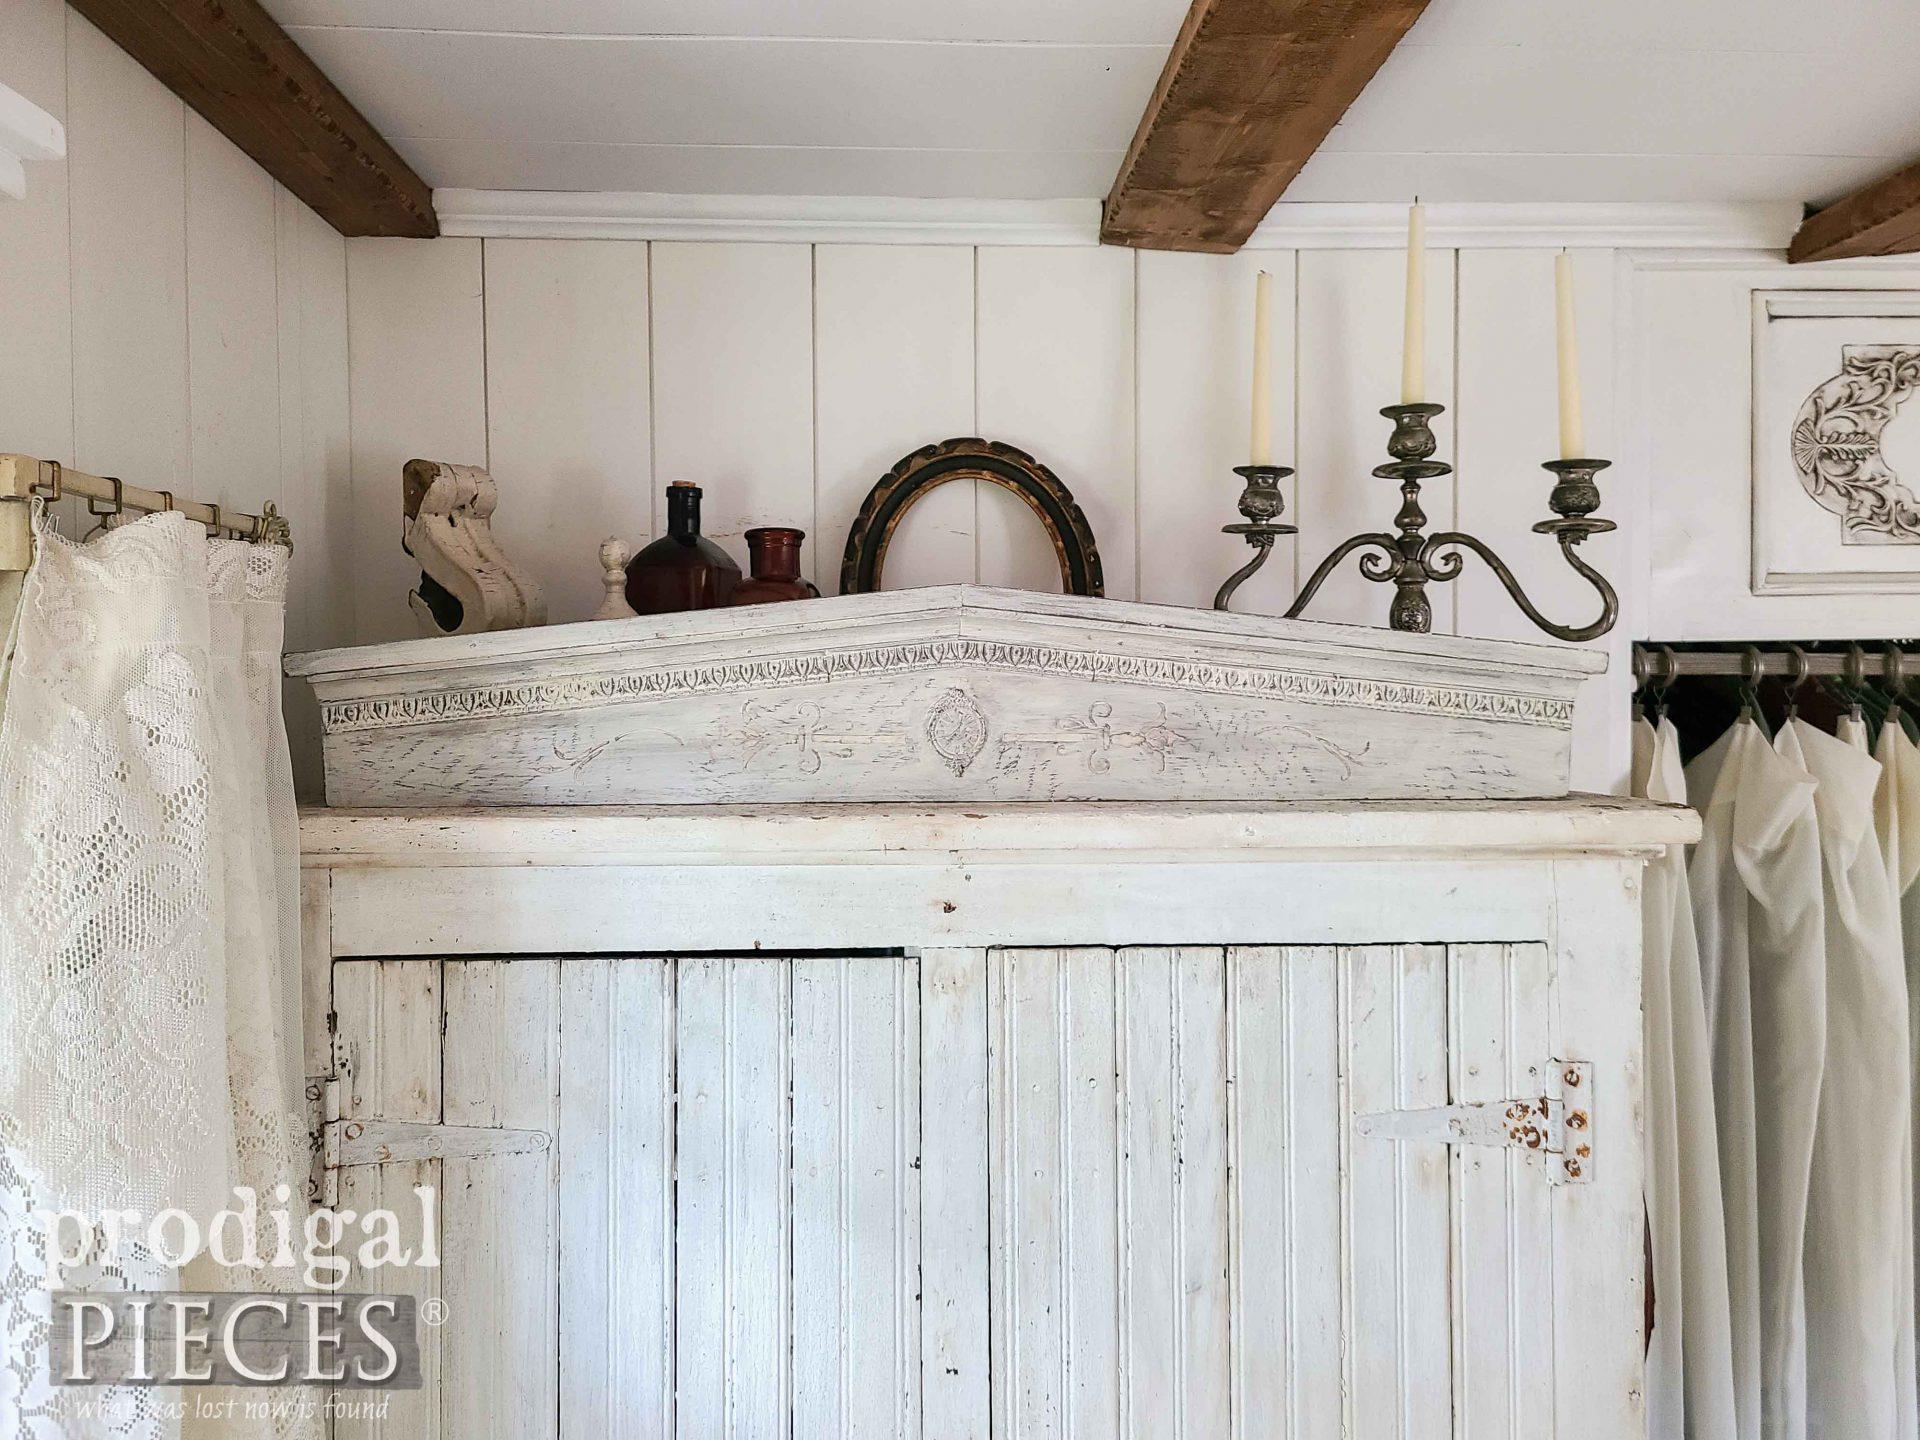 DIY Farmhouse Pediment from Box Store Decor by Larissa of Prodigal Pieces | prodigalpieces.com #prodigalpieces #farmhouse #rustic #diy #home